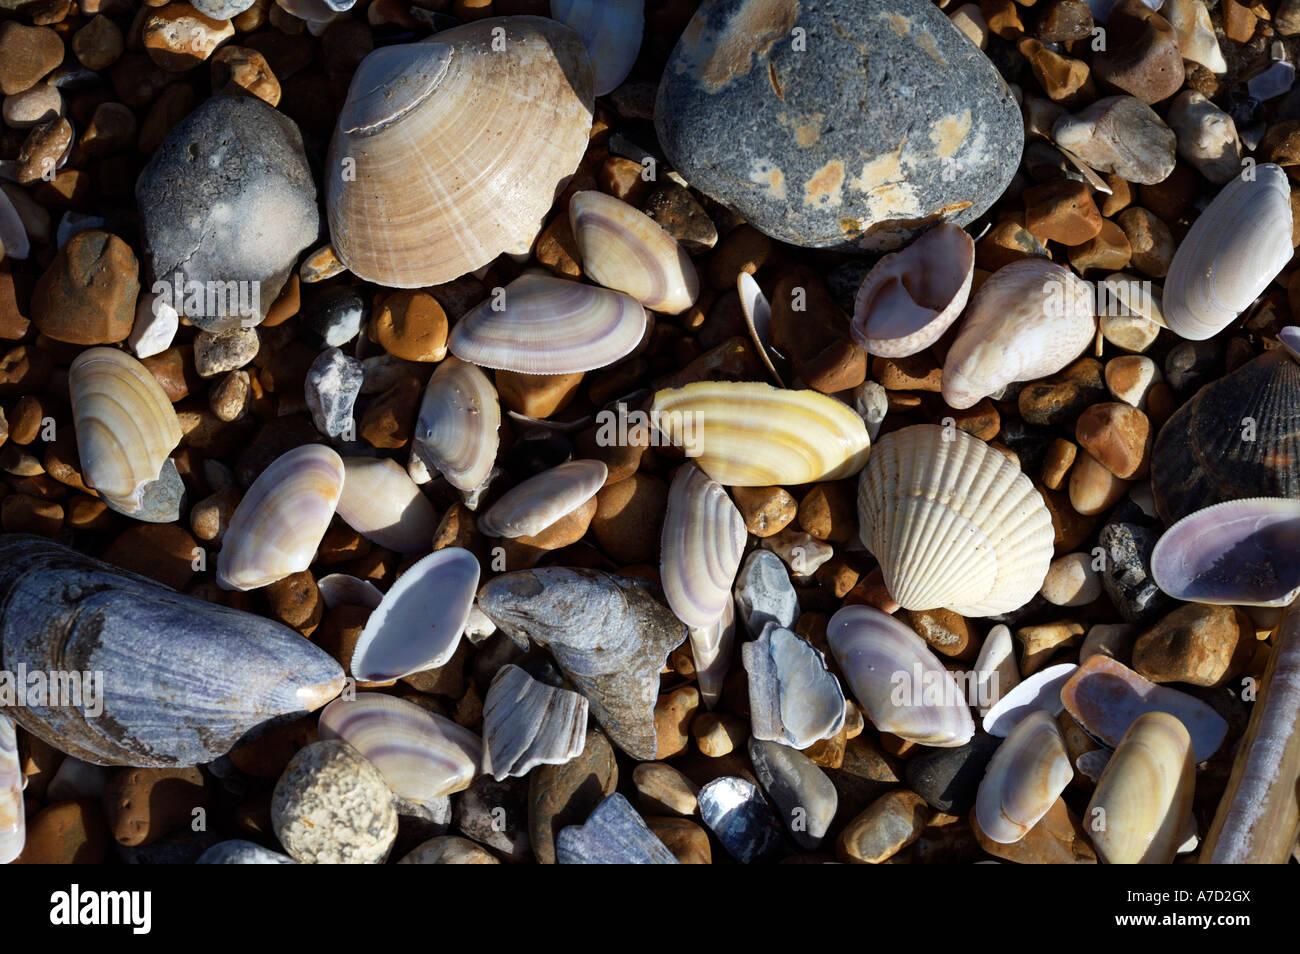 Sea Shore Shells And Pebbles - Stock Image